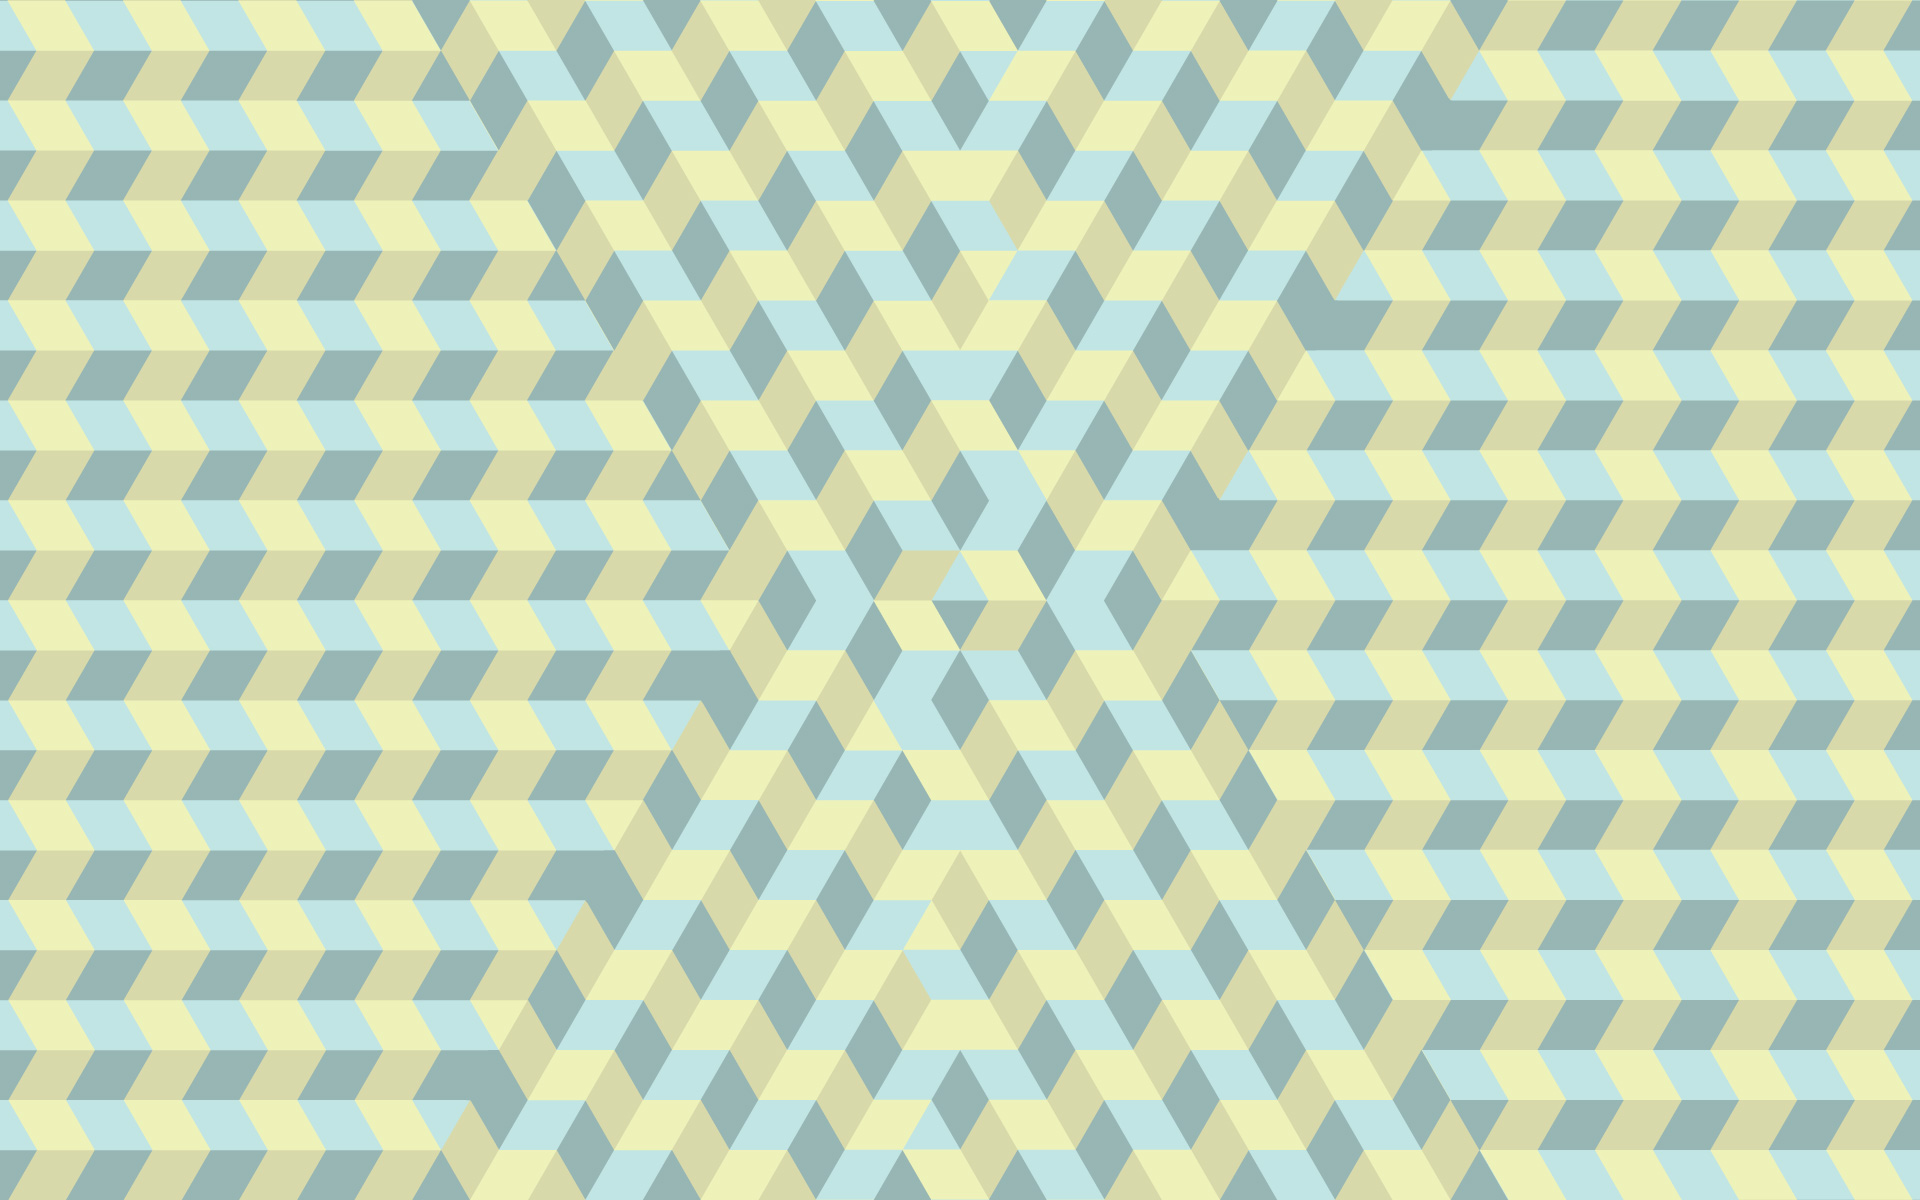 pattern_10.jpg